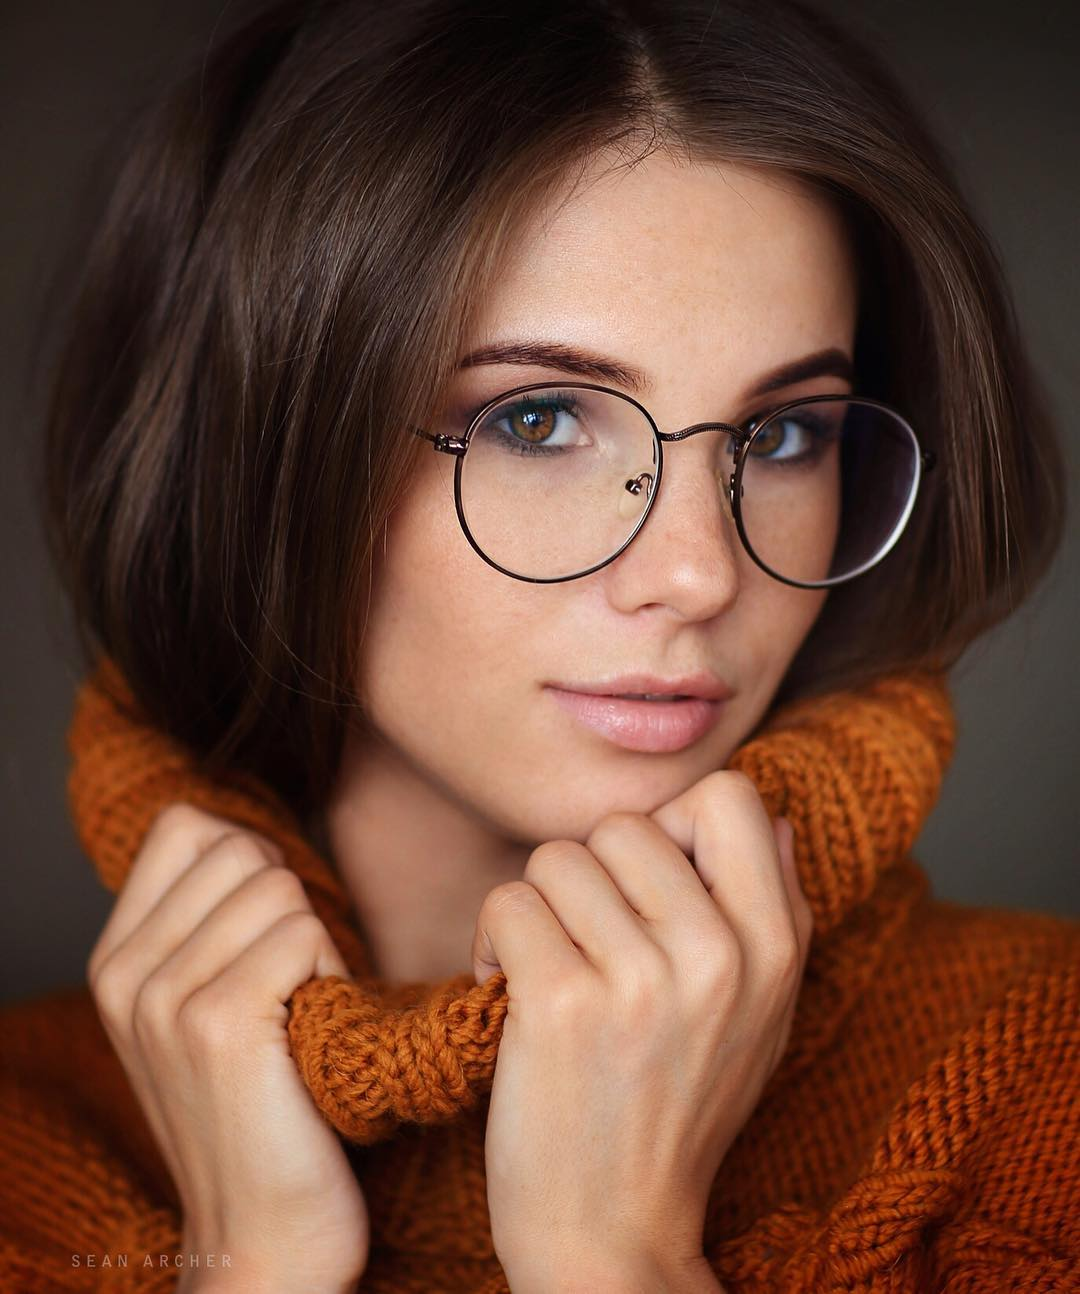 Anna-Kudinova-Wallpapers-Insta-Fit-Bio-12